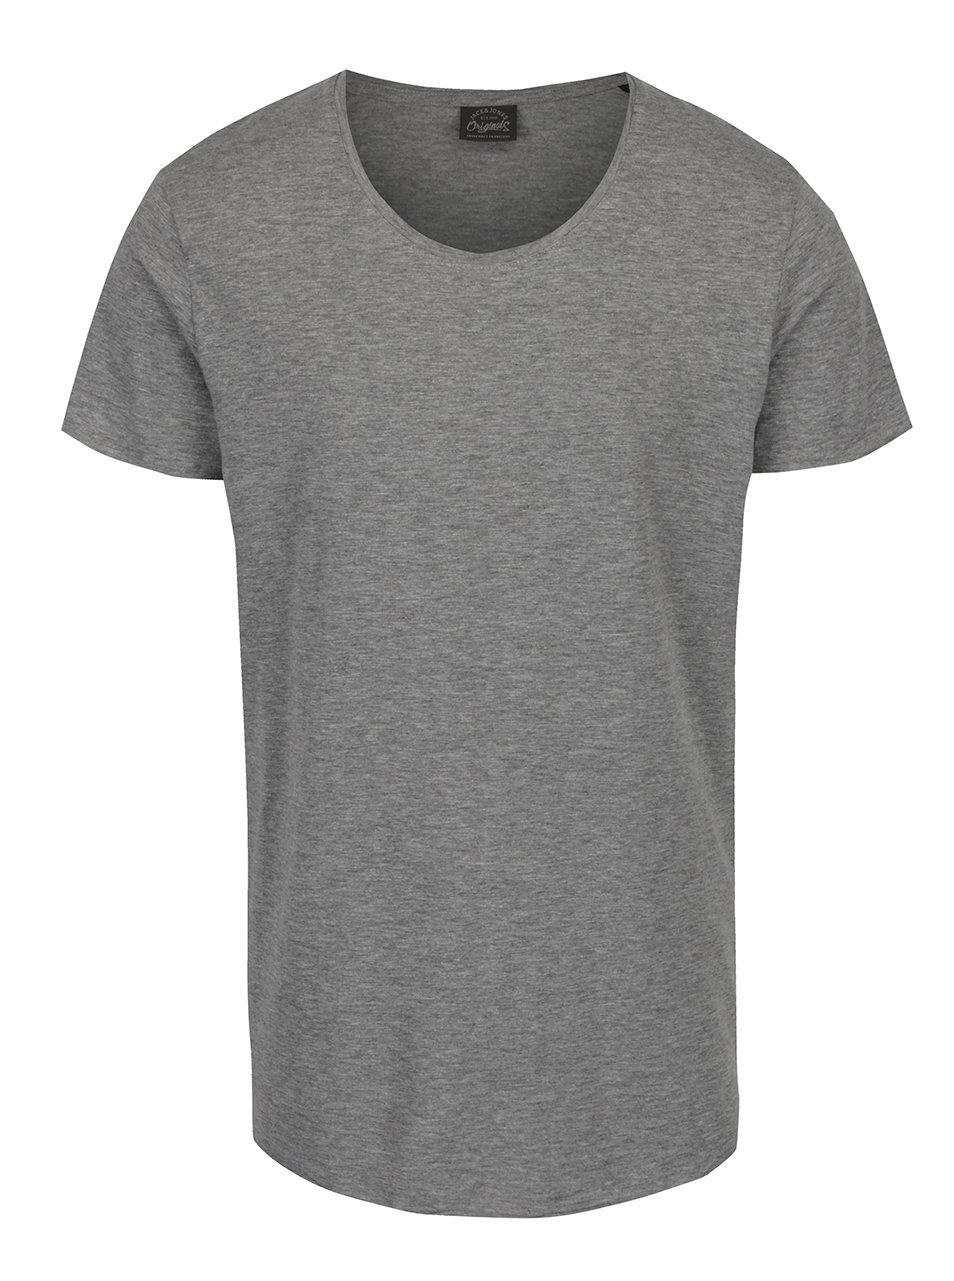 Šedé tričko Jack & Jones Orbas